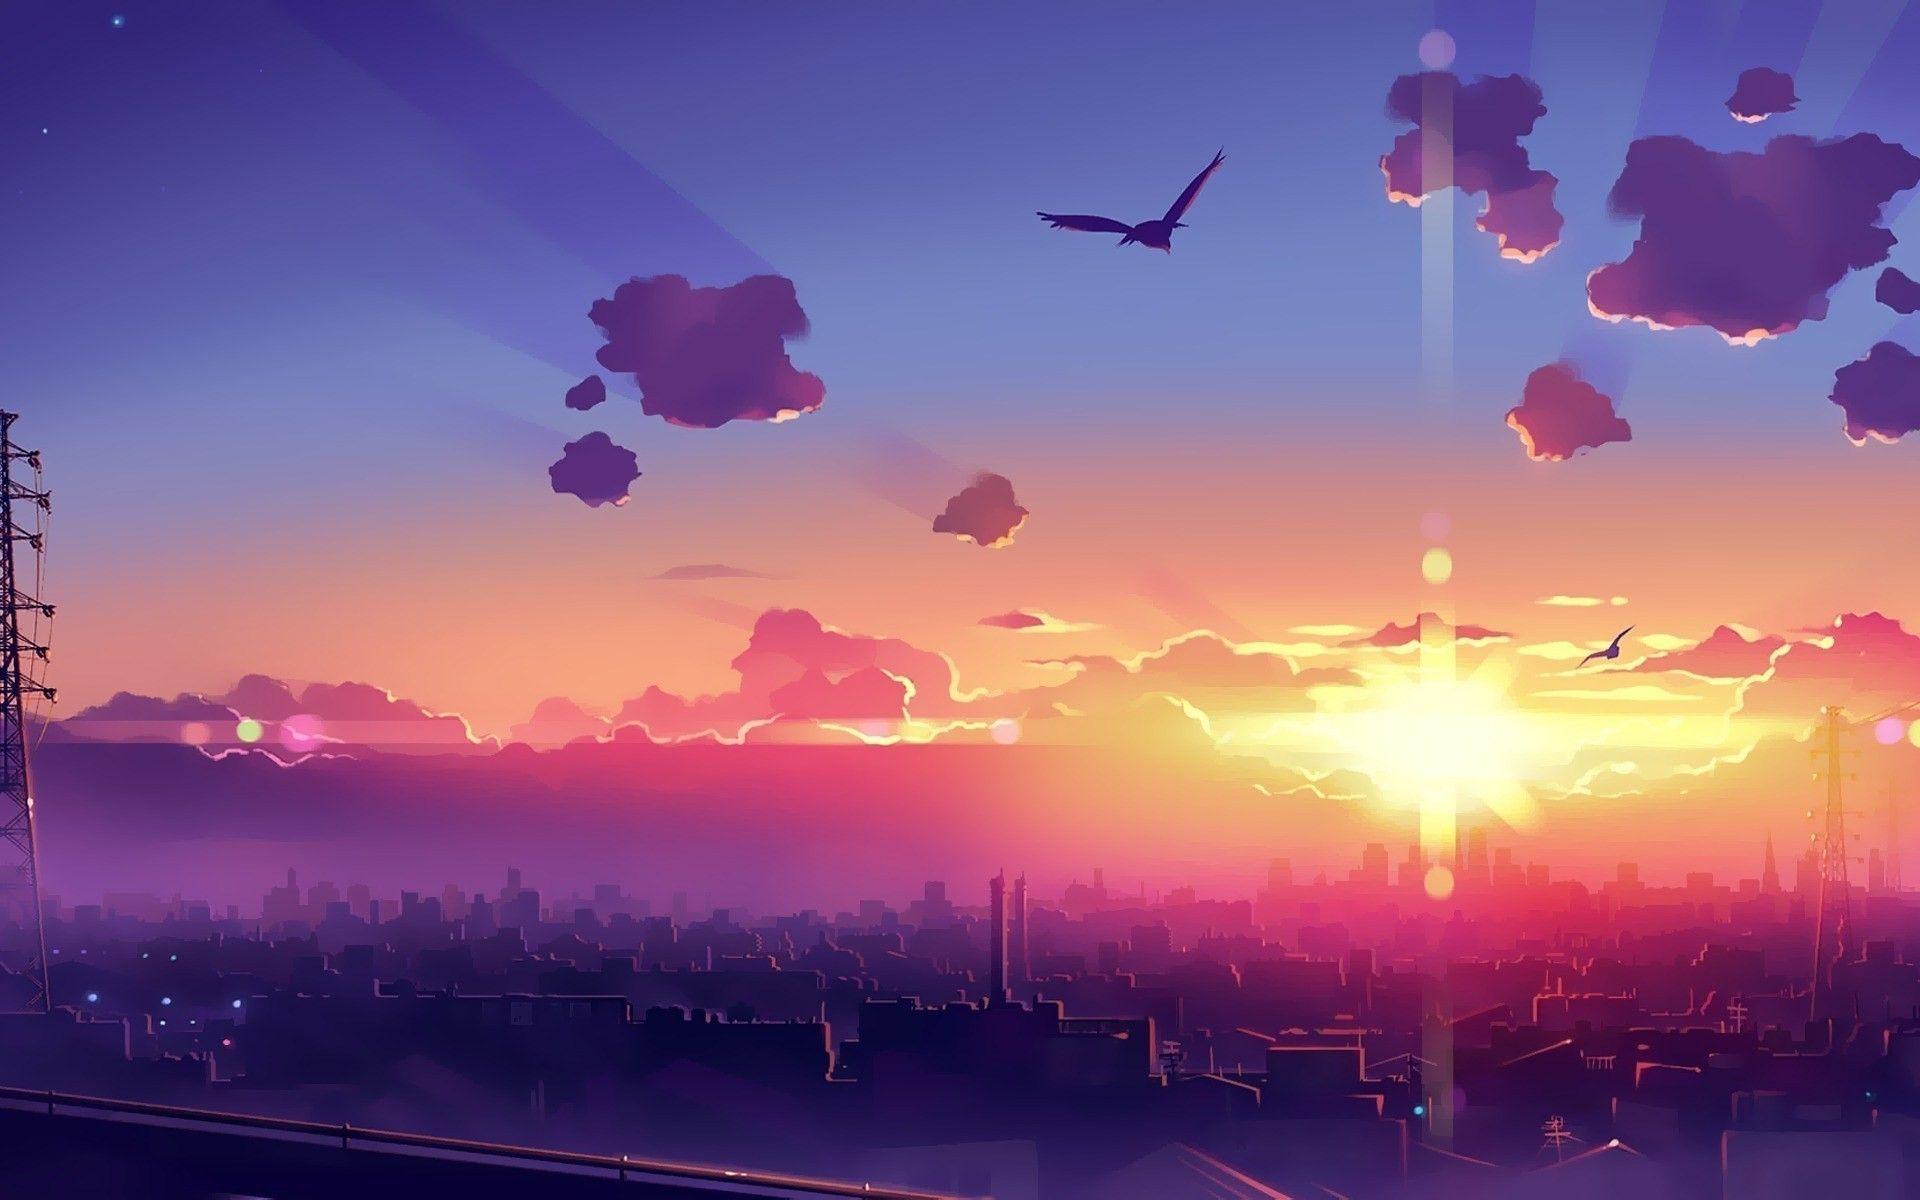 Anime Wallpapers Backgrounds Anime Scenery Wallpaper Sunrise